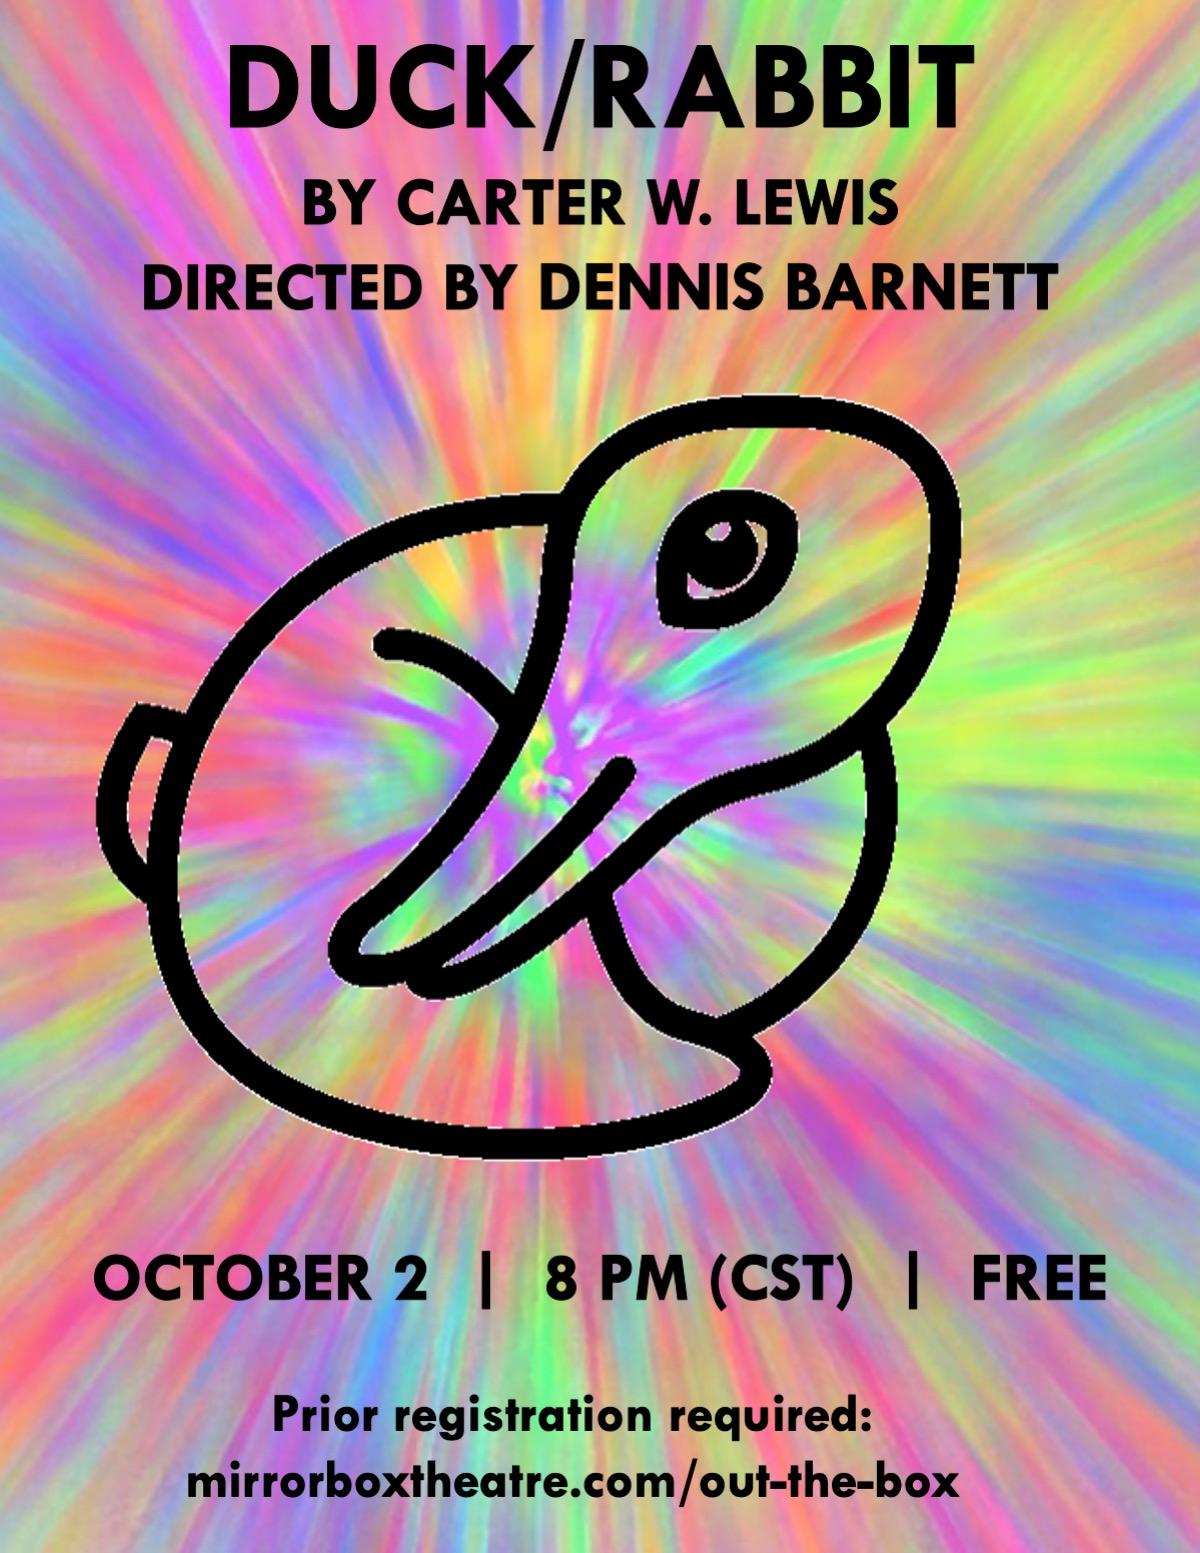 DuckRabbit_Poster